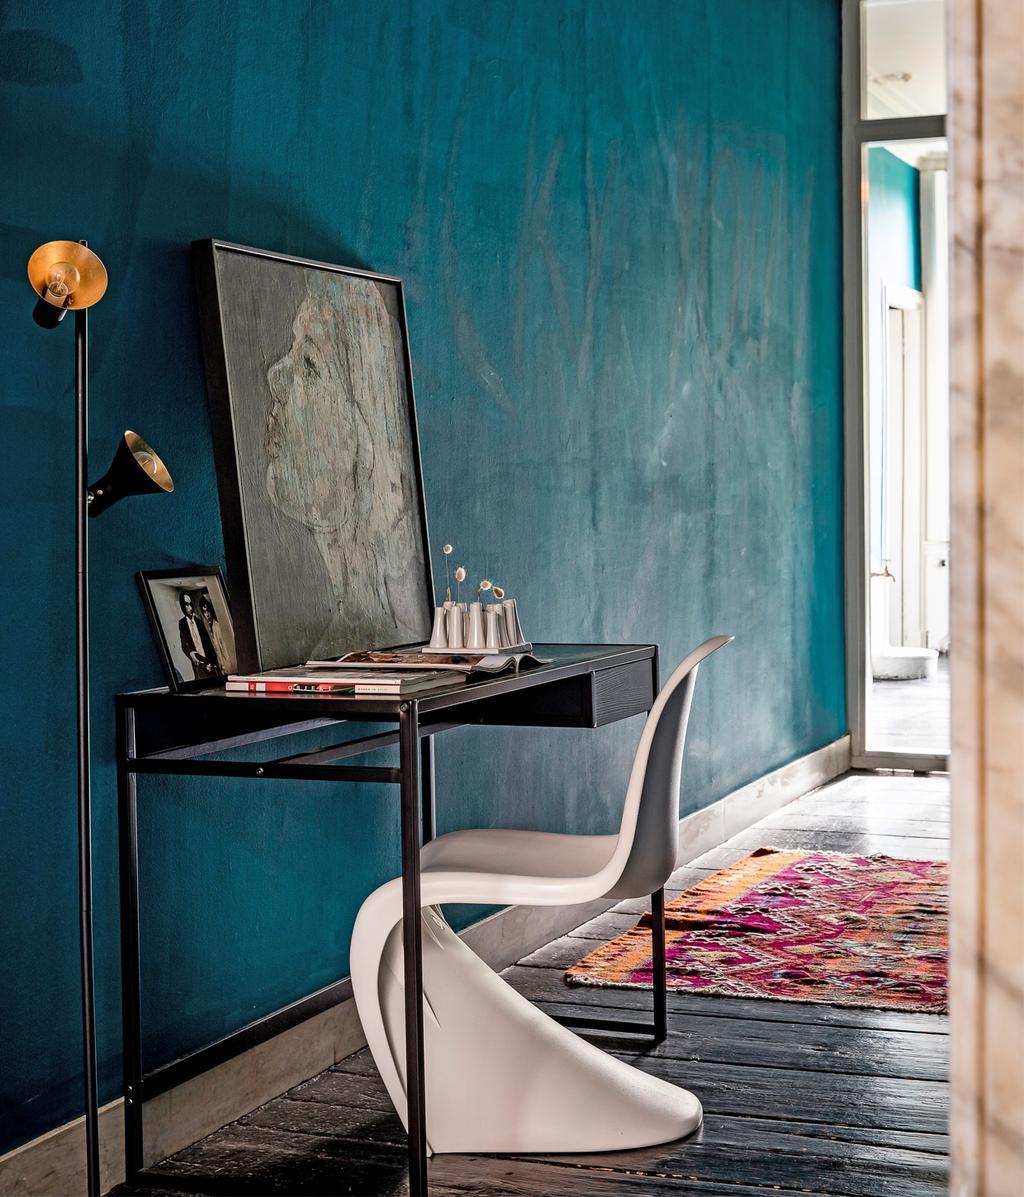 Bureau | blauwe muur | vtwonen 01-2021